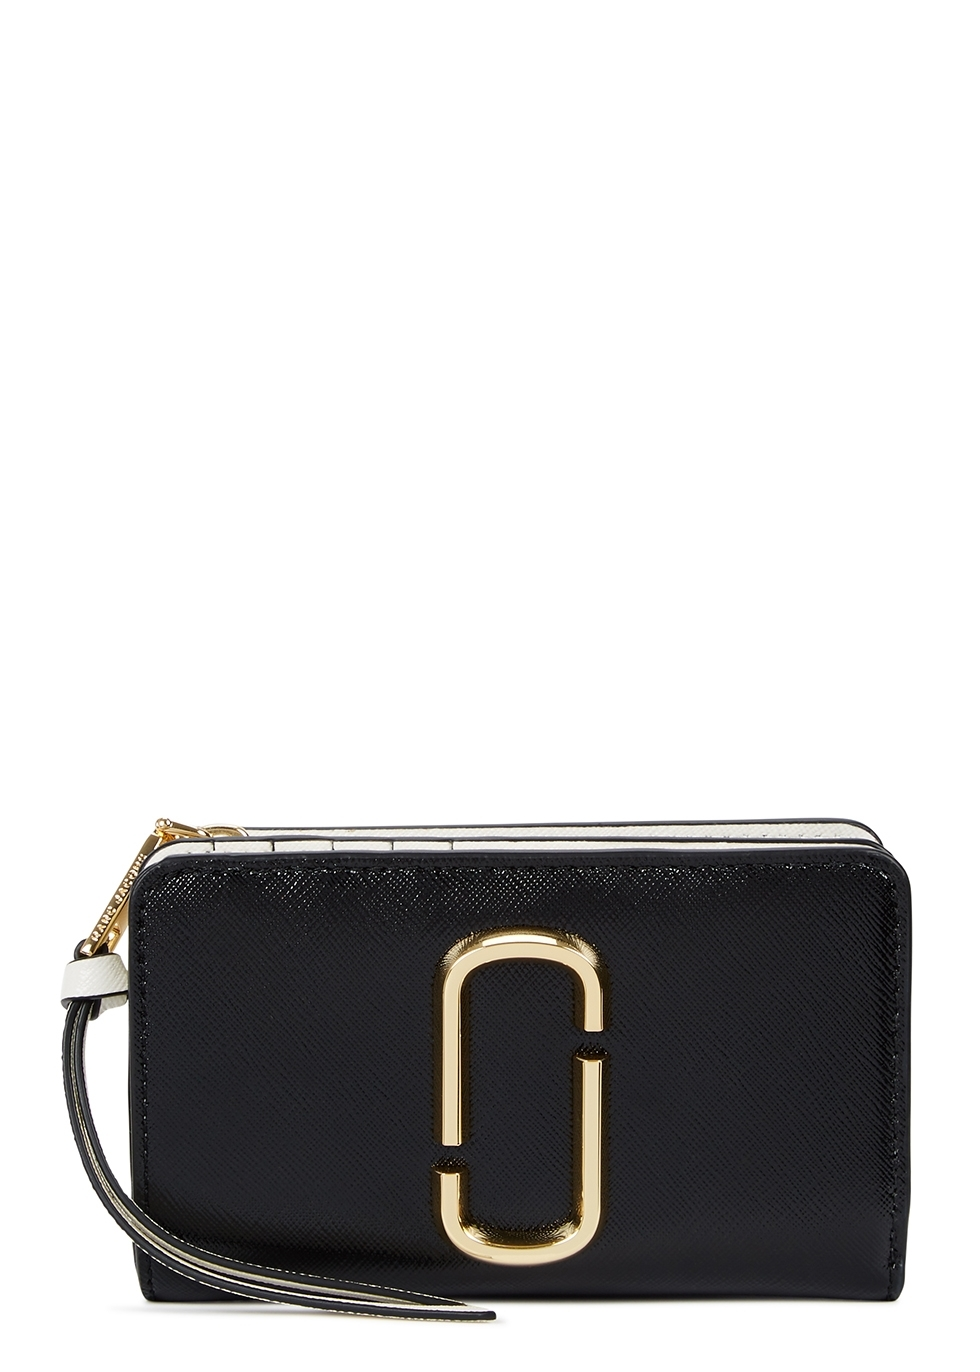 74c70c77c6 Women s Designer Purses and Wallets - Harvey Nichols